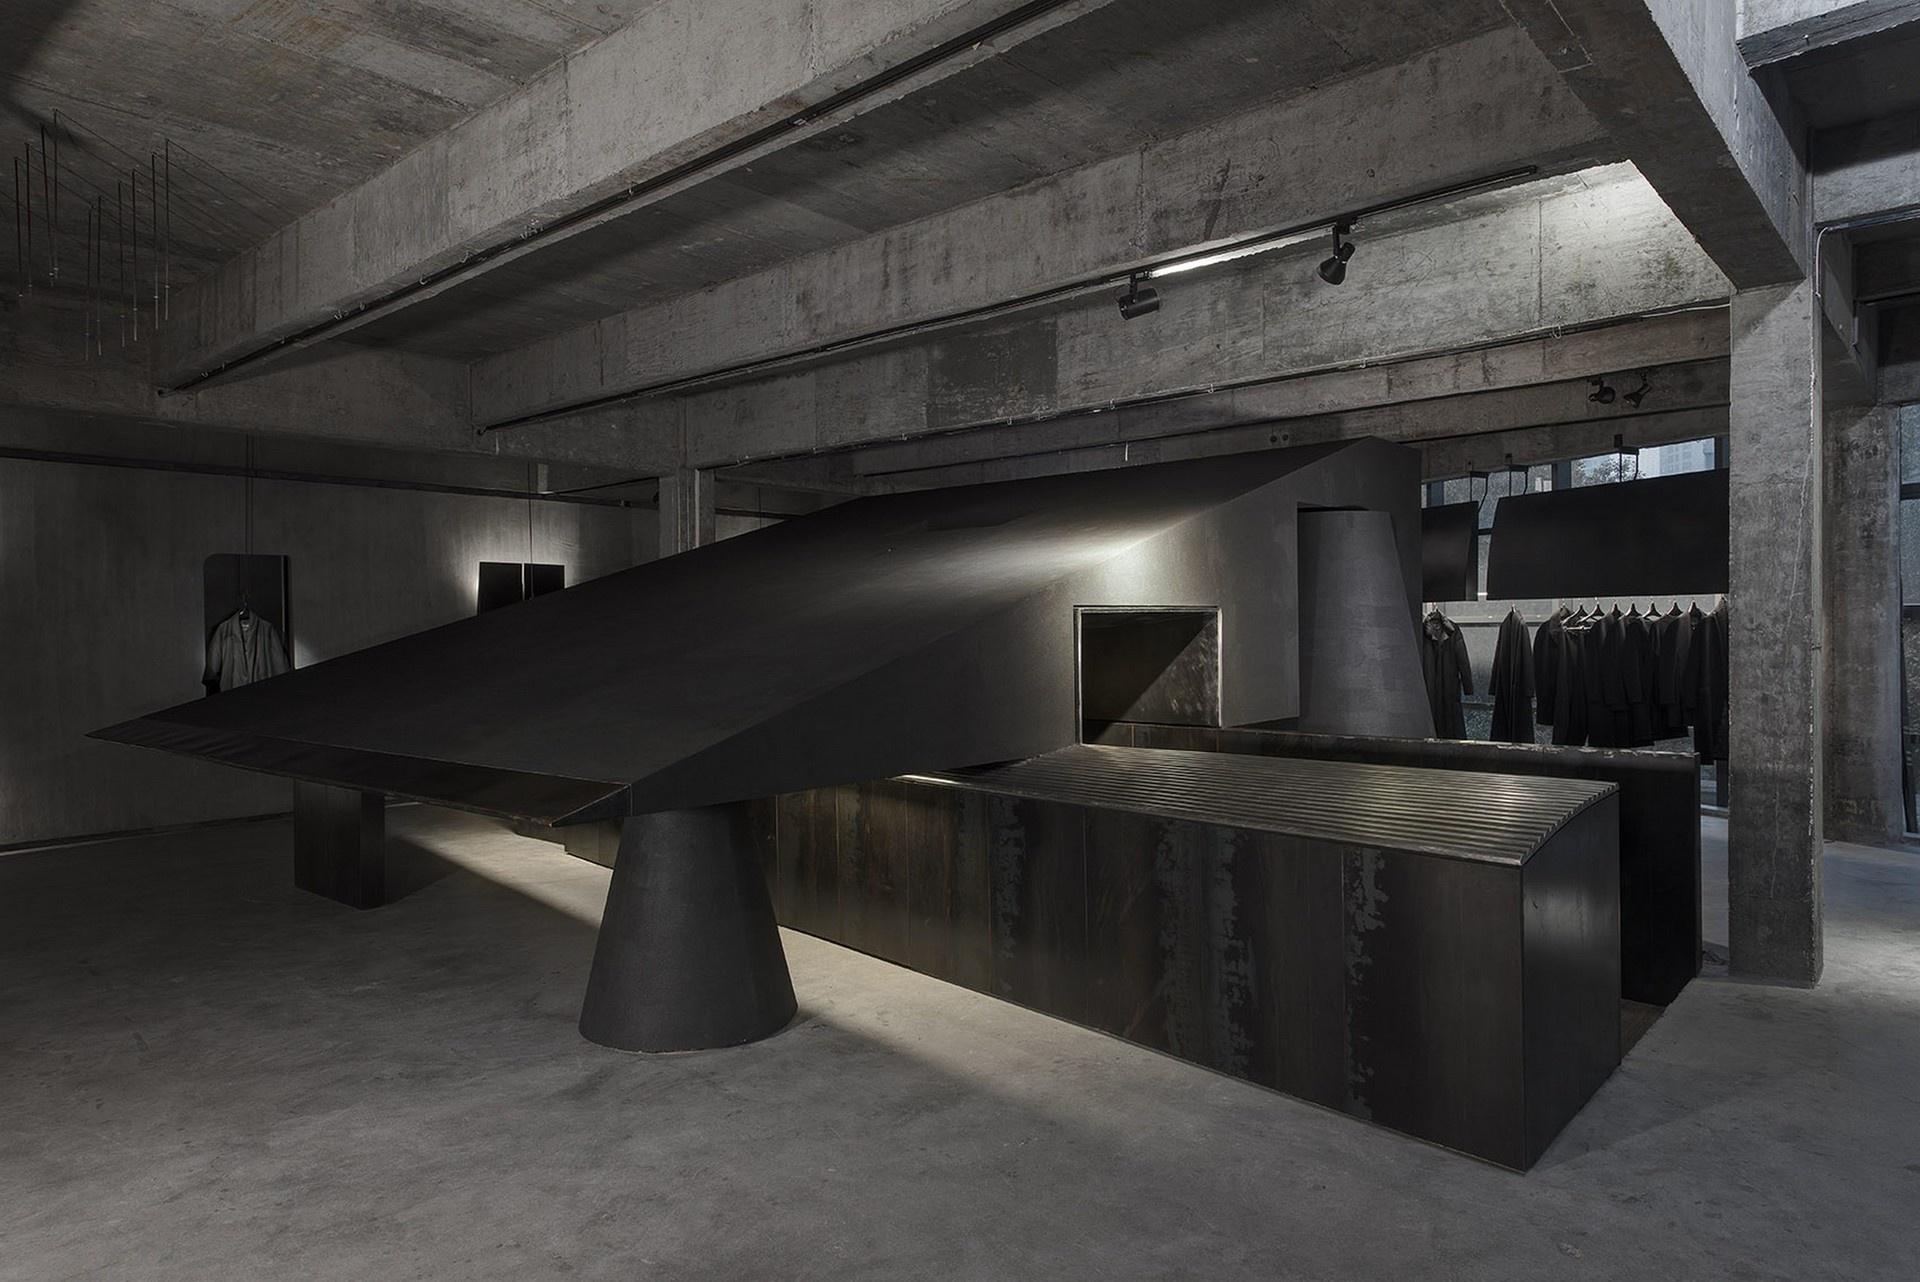 black_cant__hangzhou_an_interior_design4